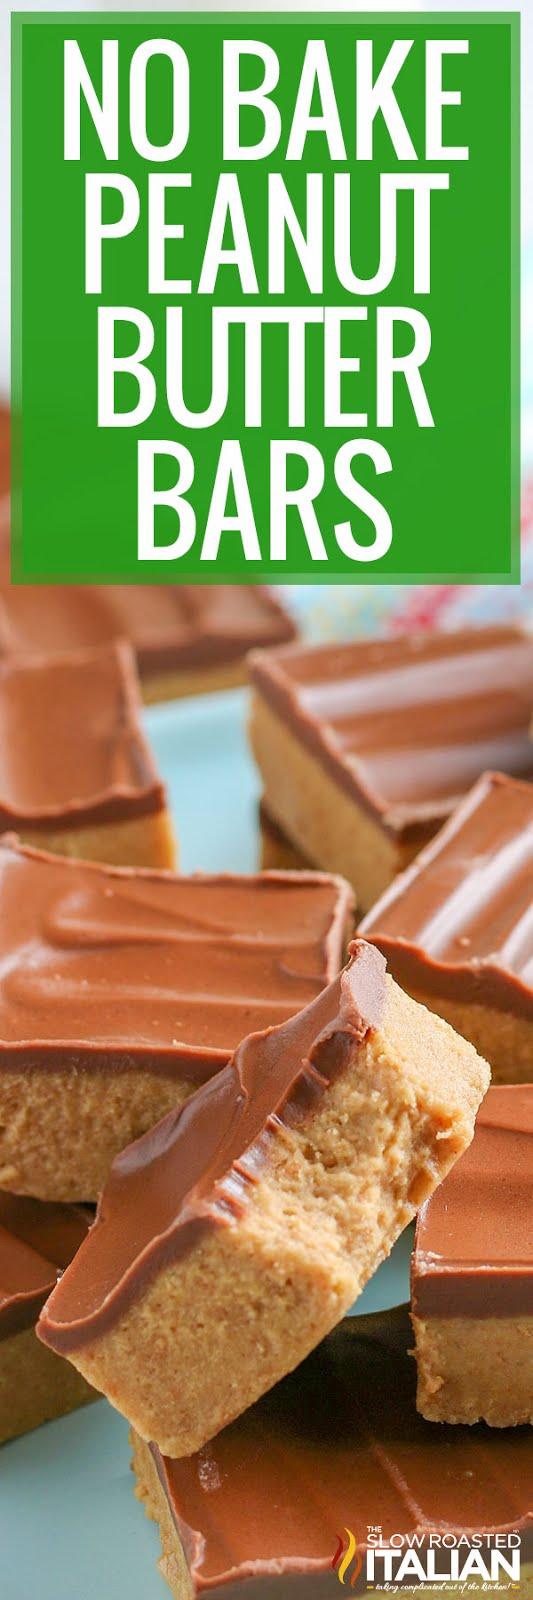 titled Pinterest image of no bake peanut butter bars